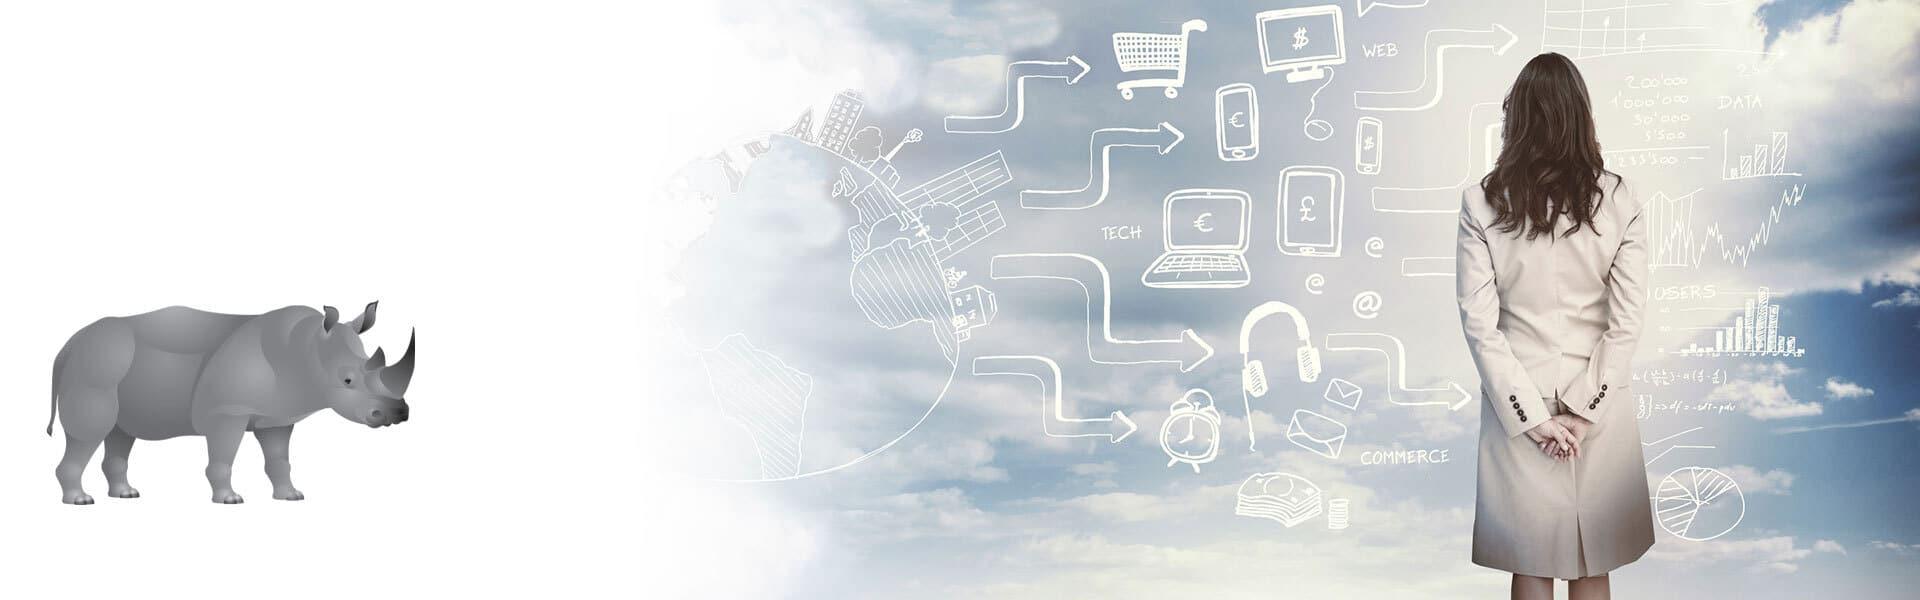 Commerce Cloud by Salesforce